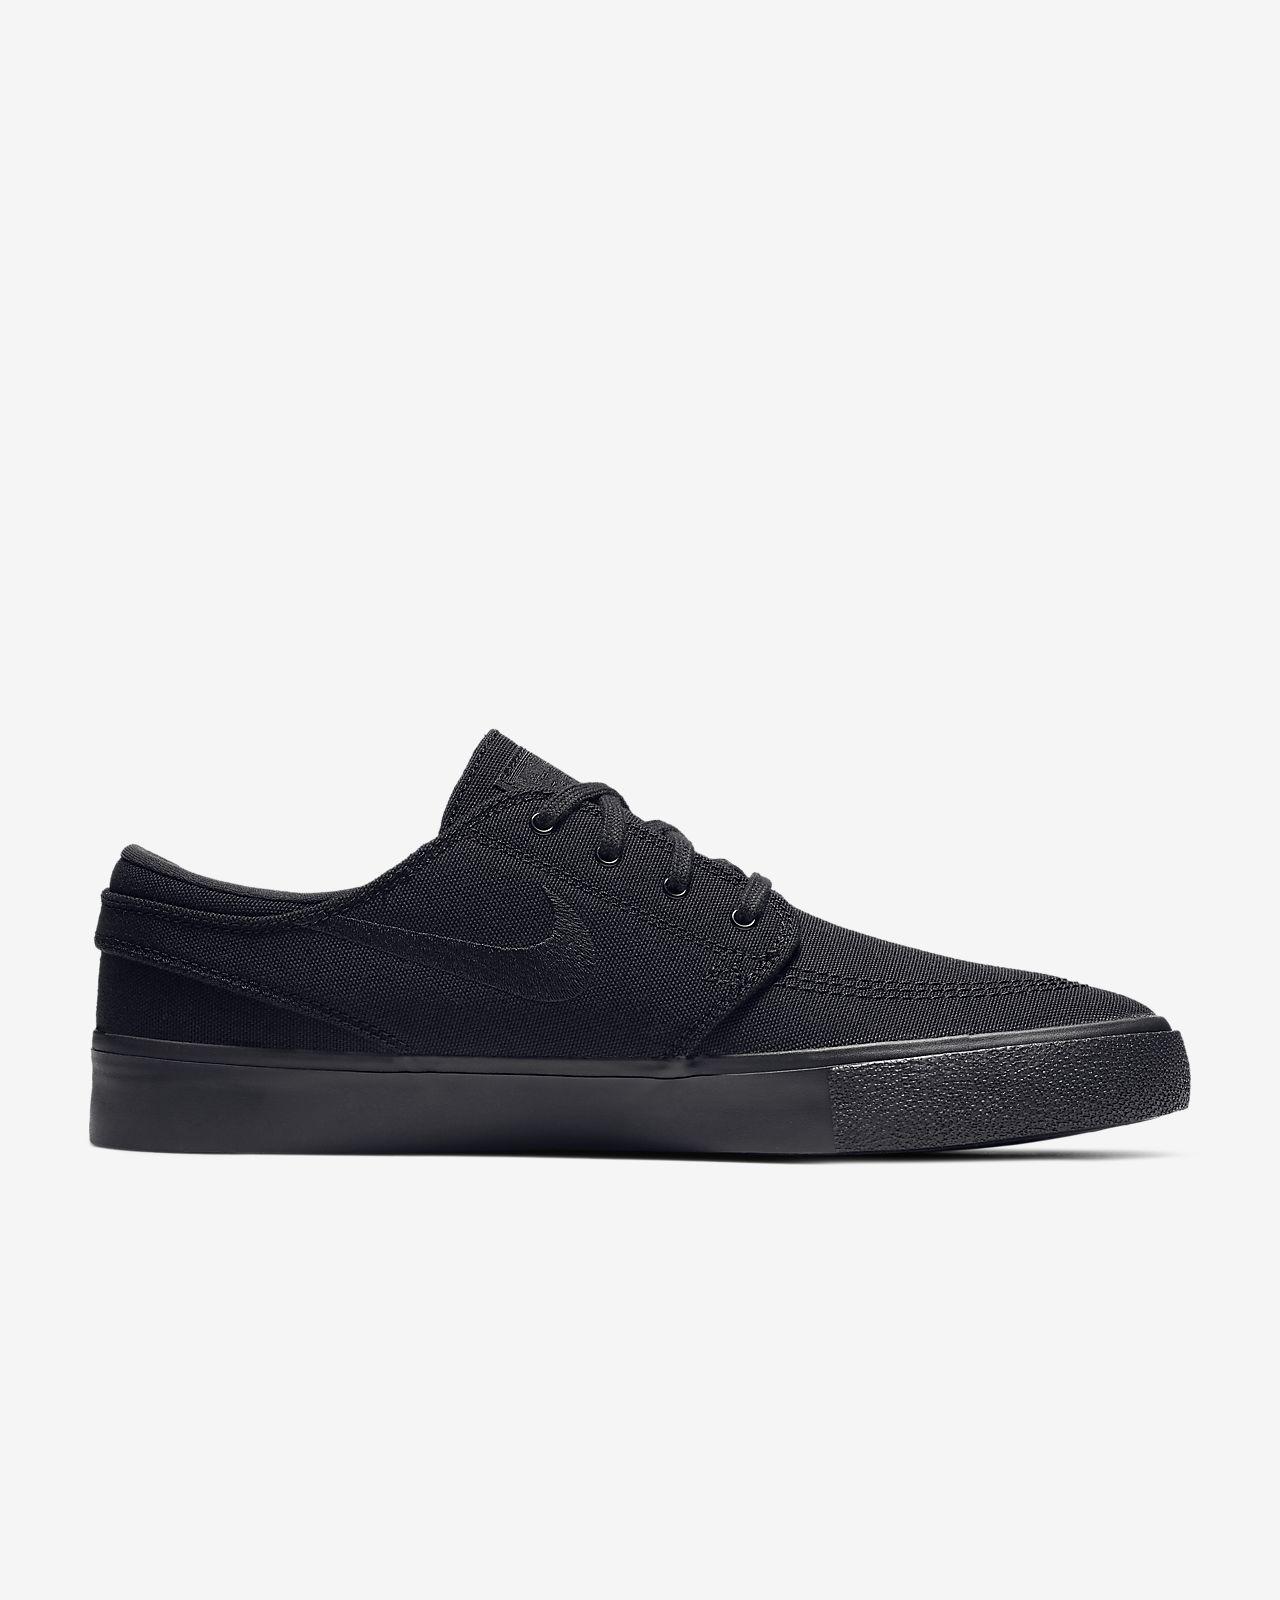 Nike SB Zoom Stefan Janoski Canvas RM gördeszkás cipő. Nike HU